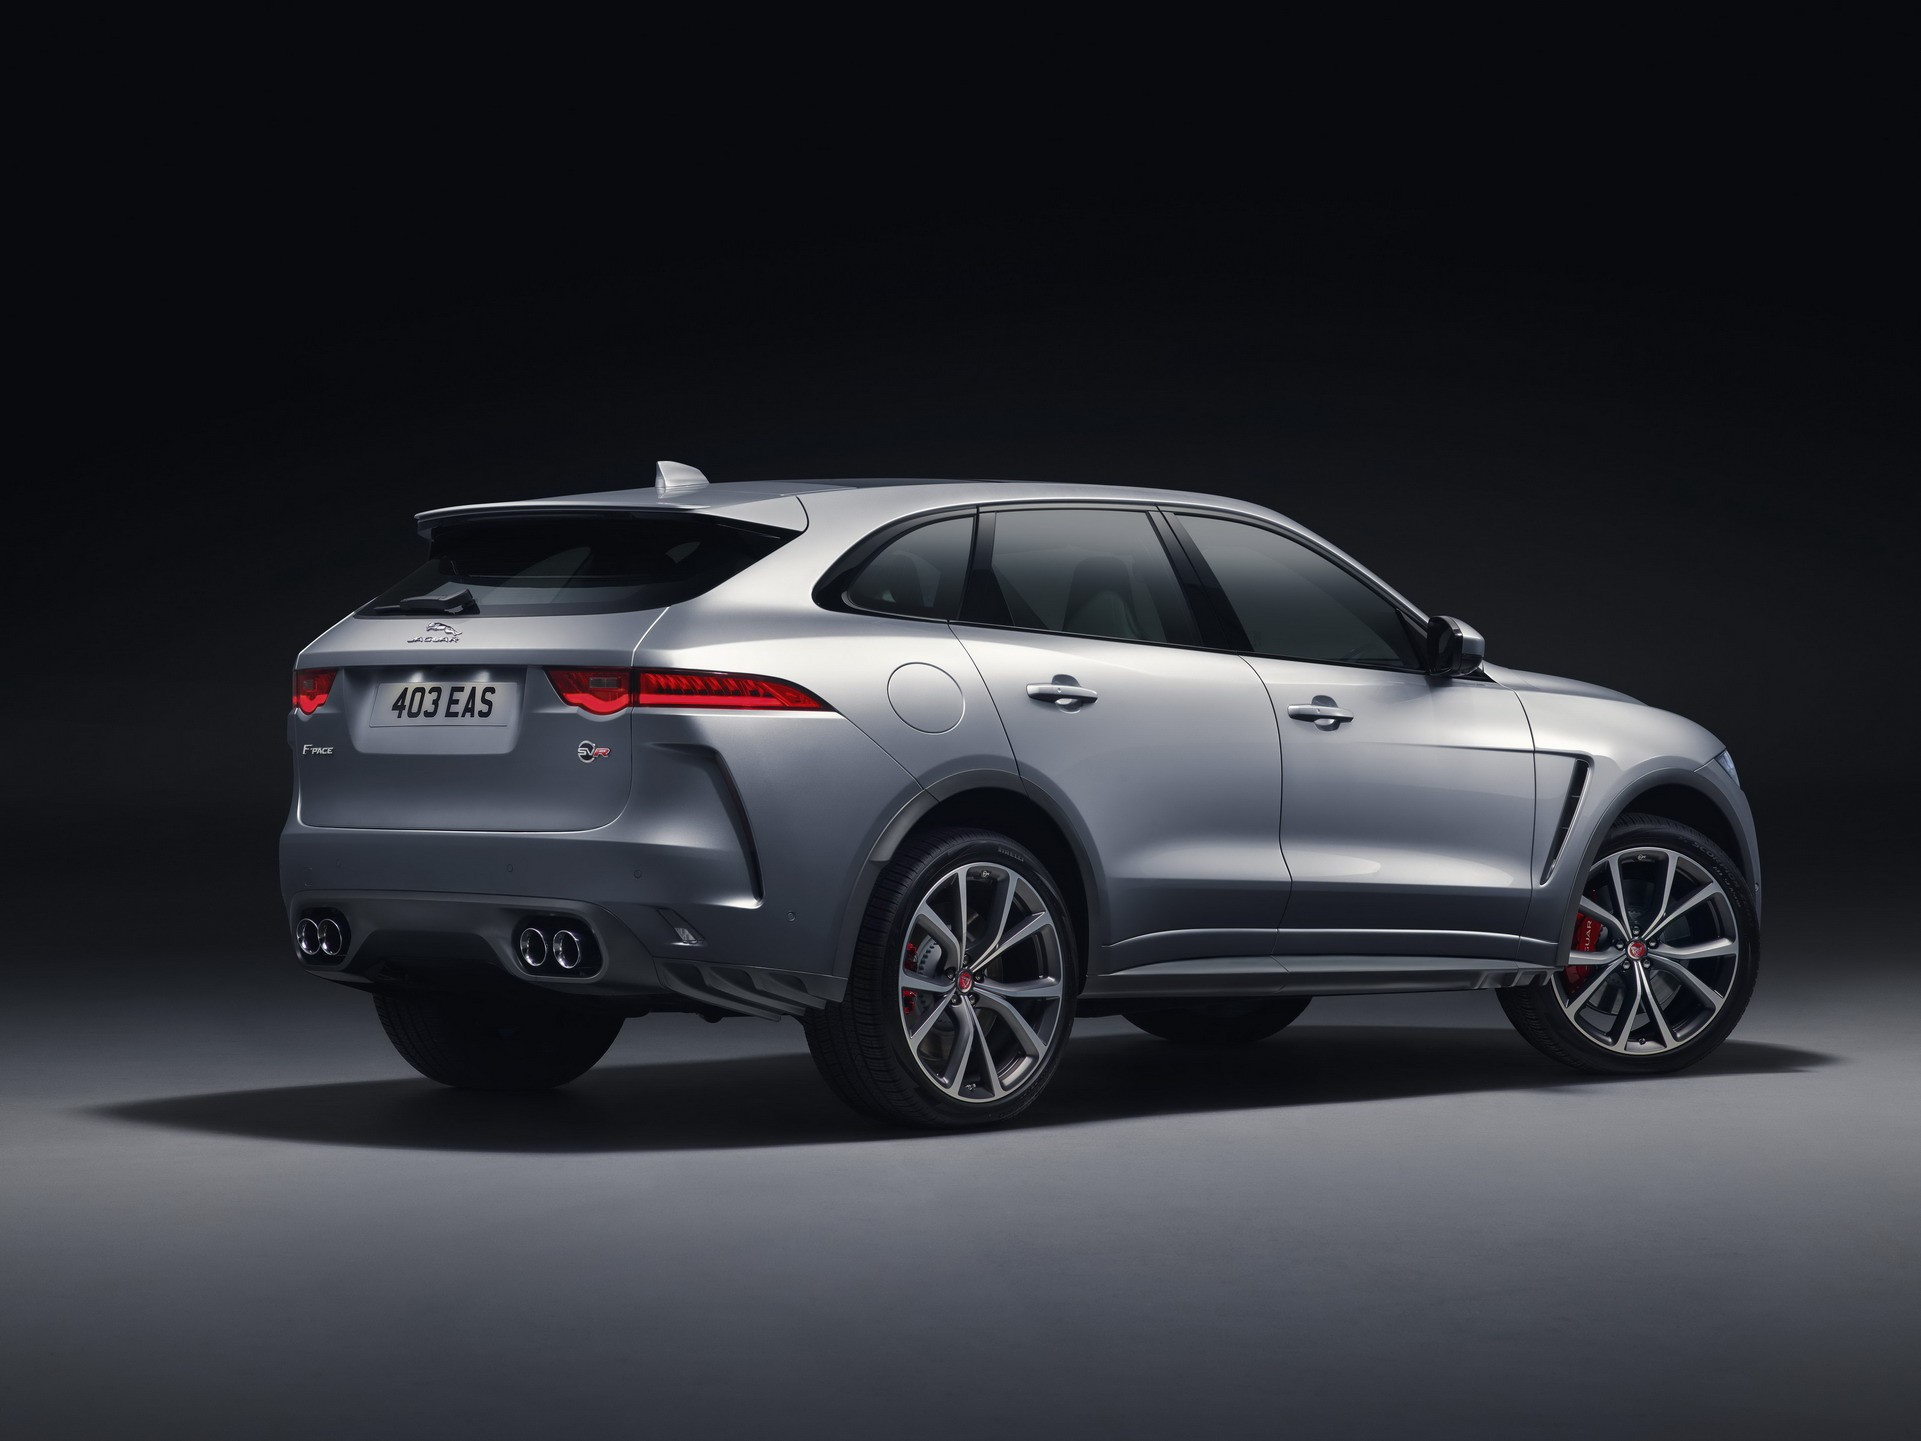 2019 Jaguar F Pace Svr Based Lister Lightning Is The World S